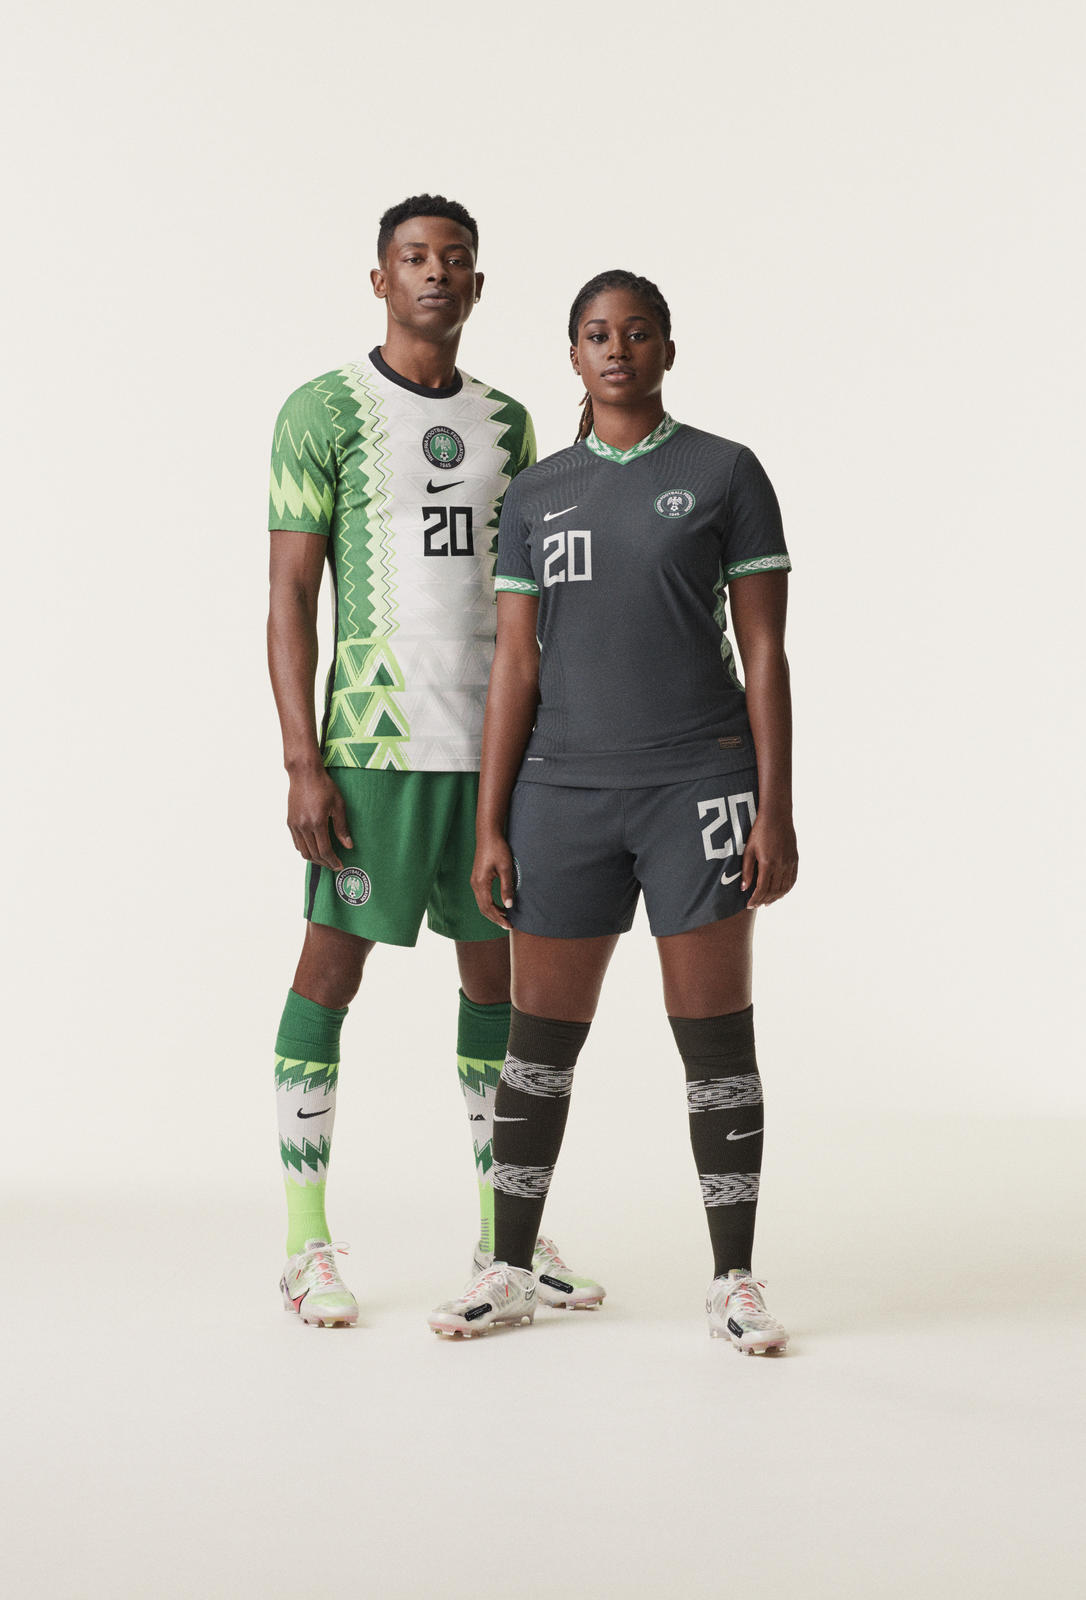 2020 nigeria kit